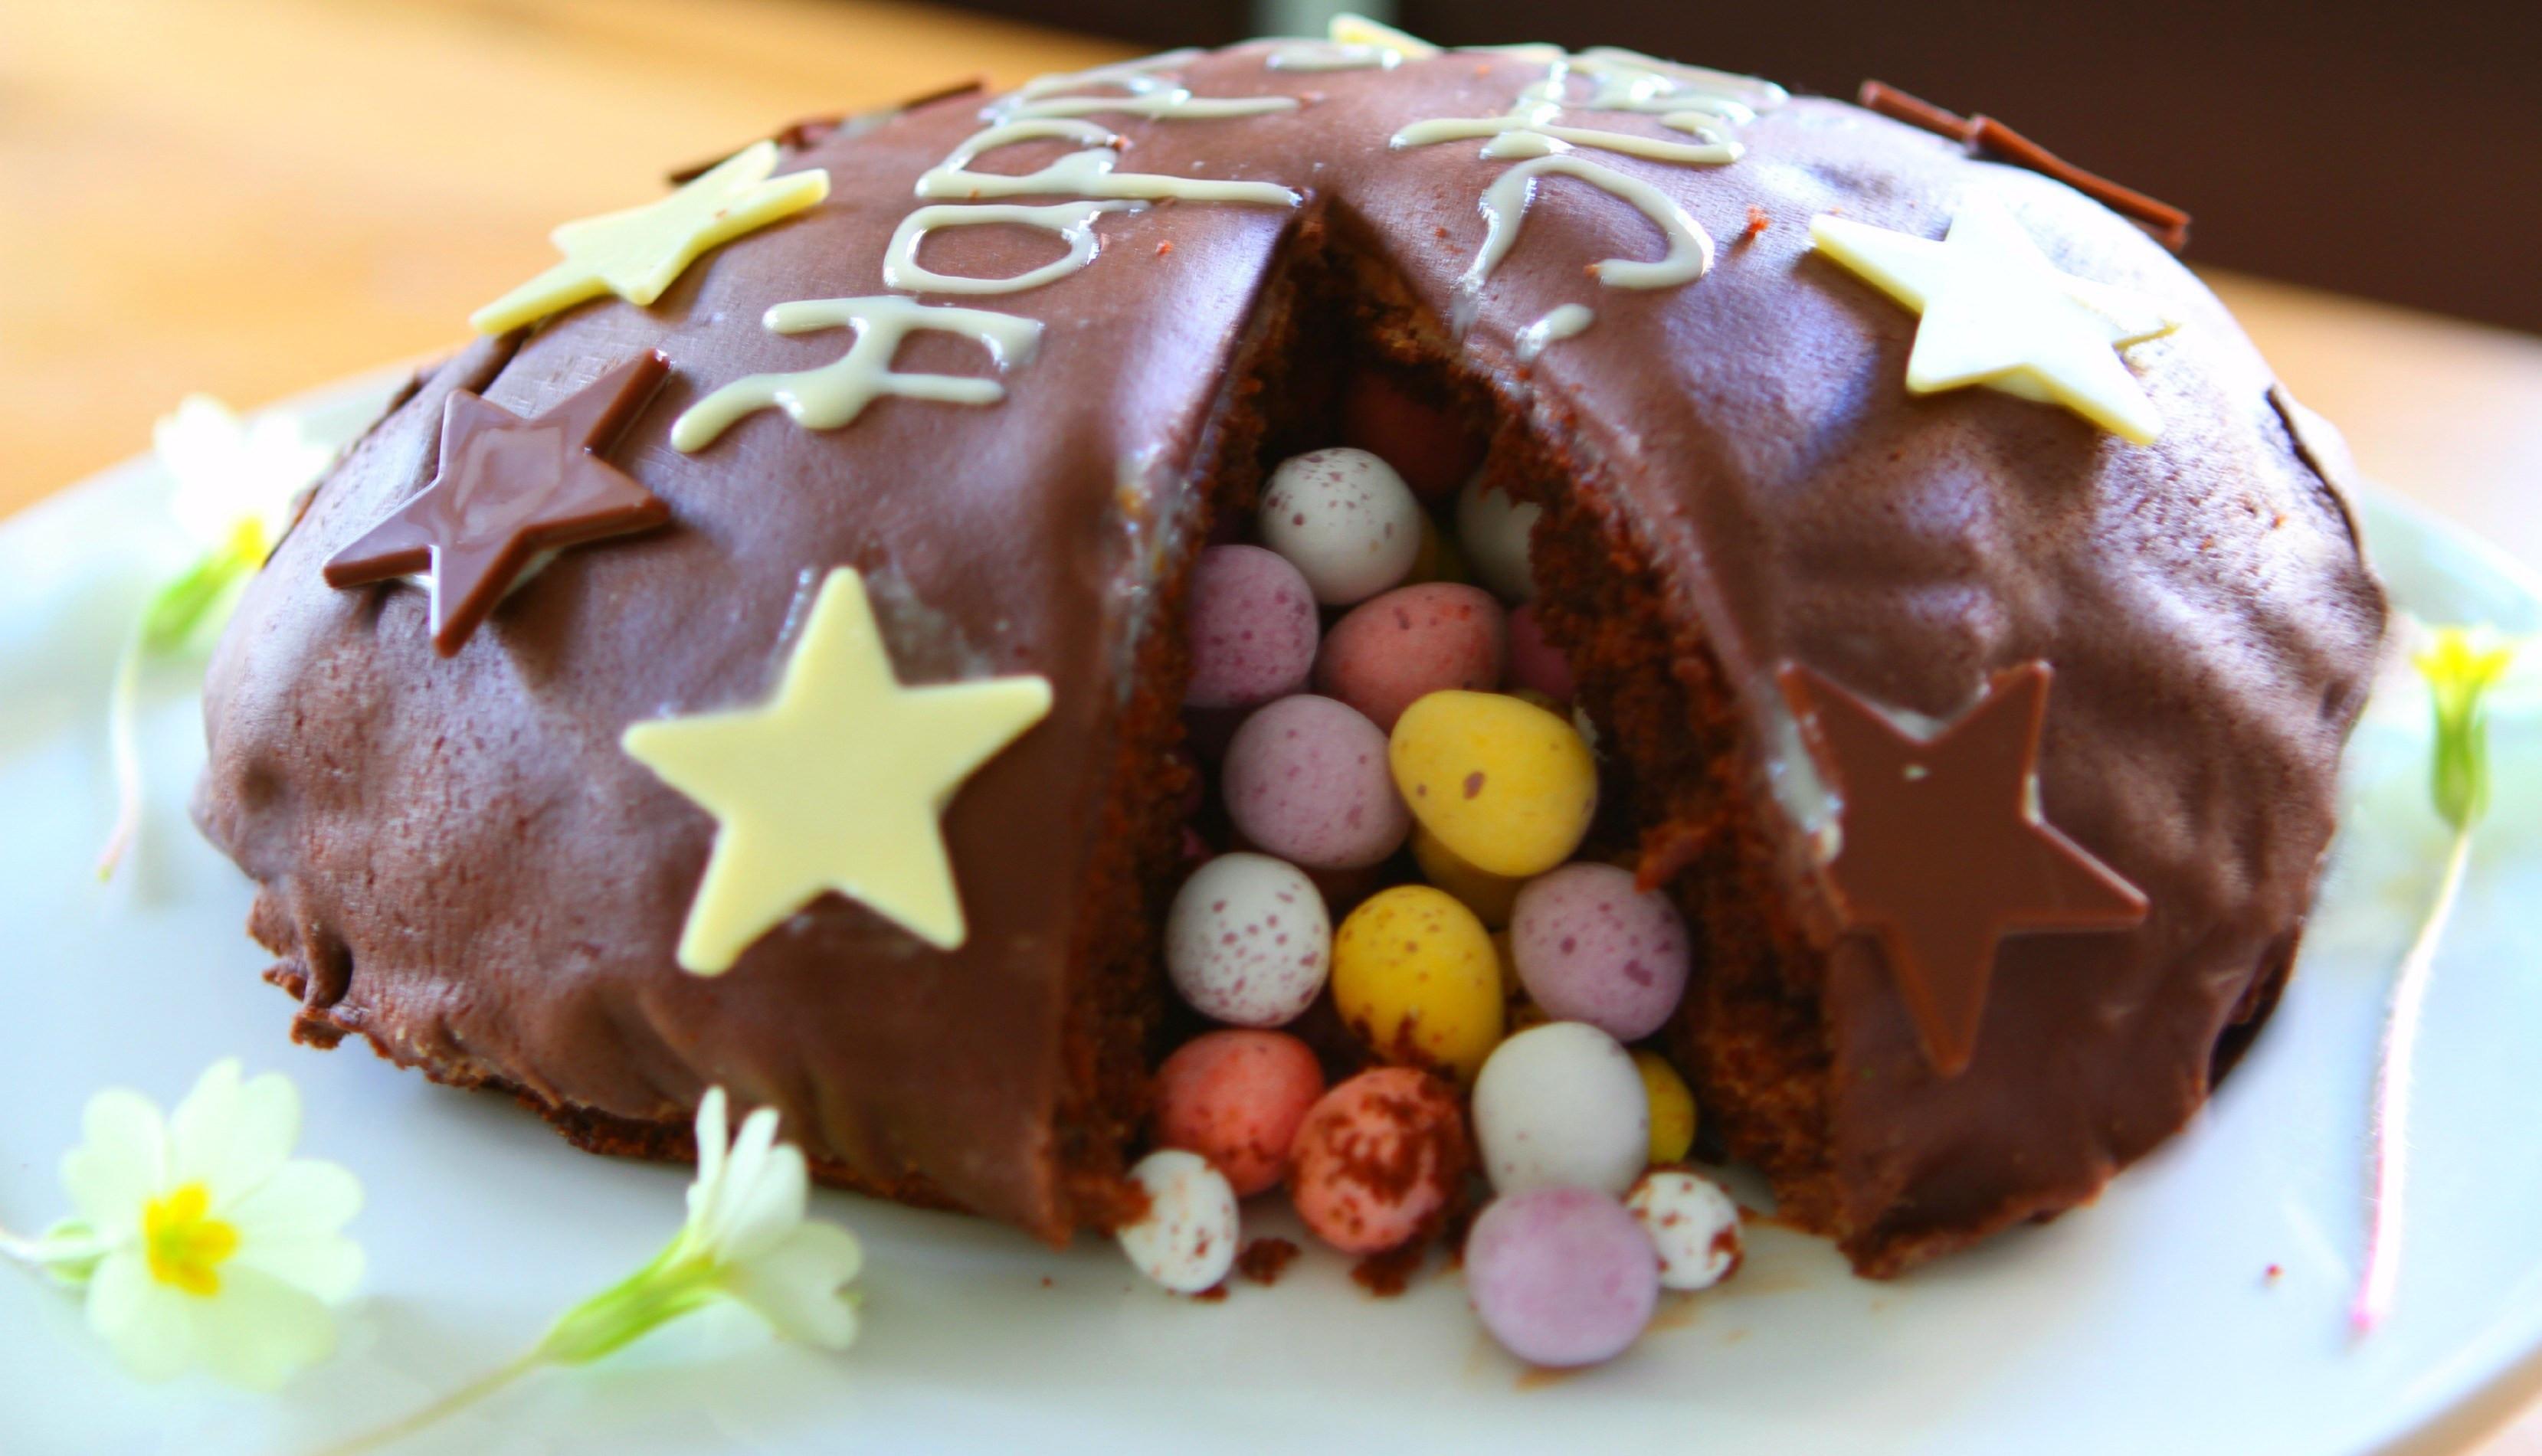 Chocolate Easter Cake  Chocolate Easter Egg Pinata Cake mummy mishaps